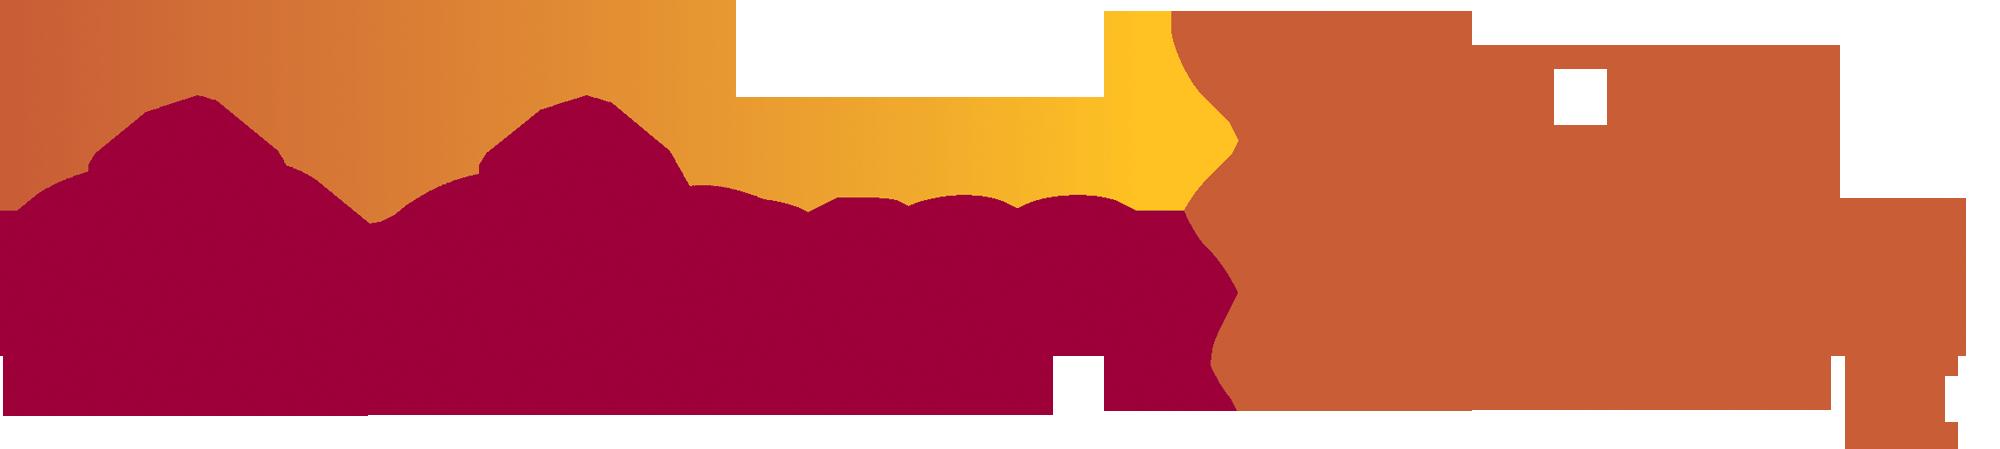 Sholom Community Alliance logo